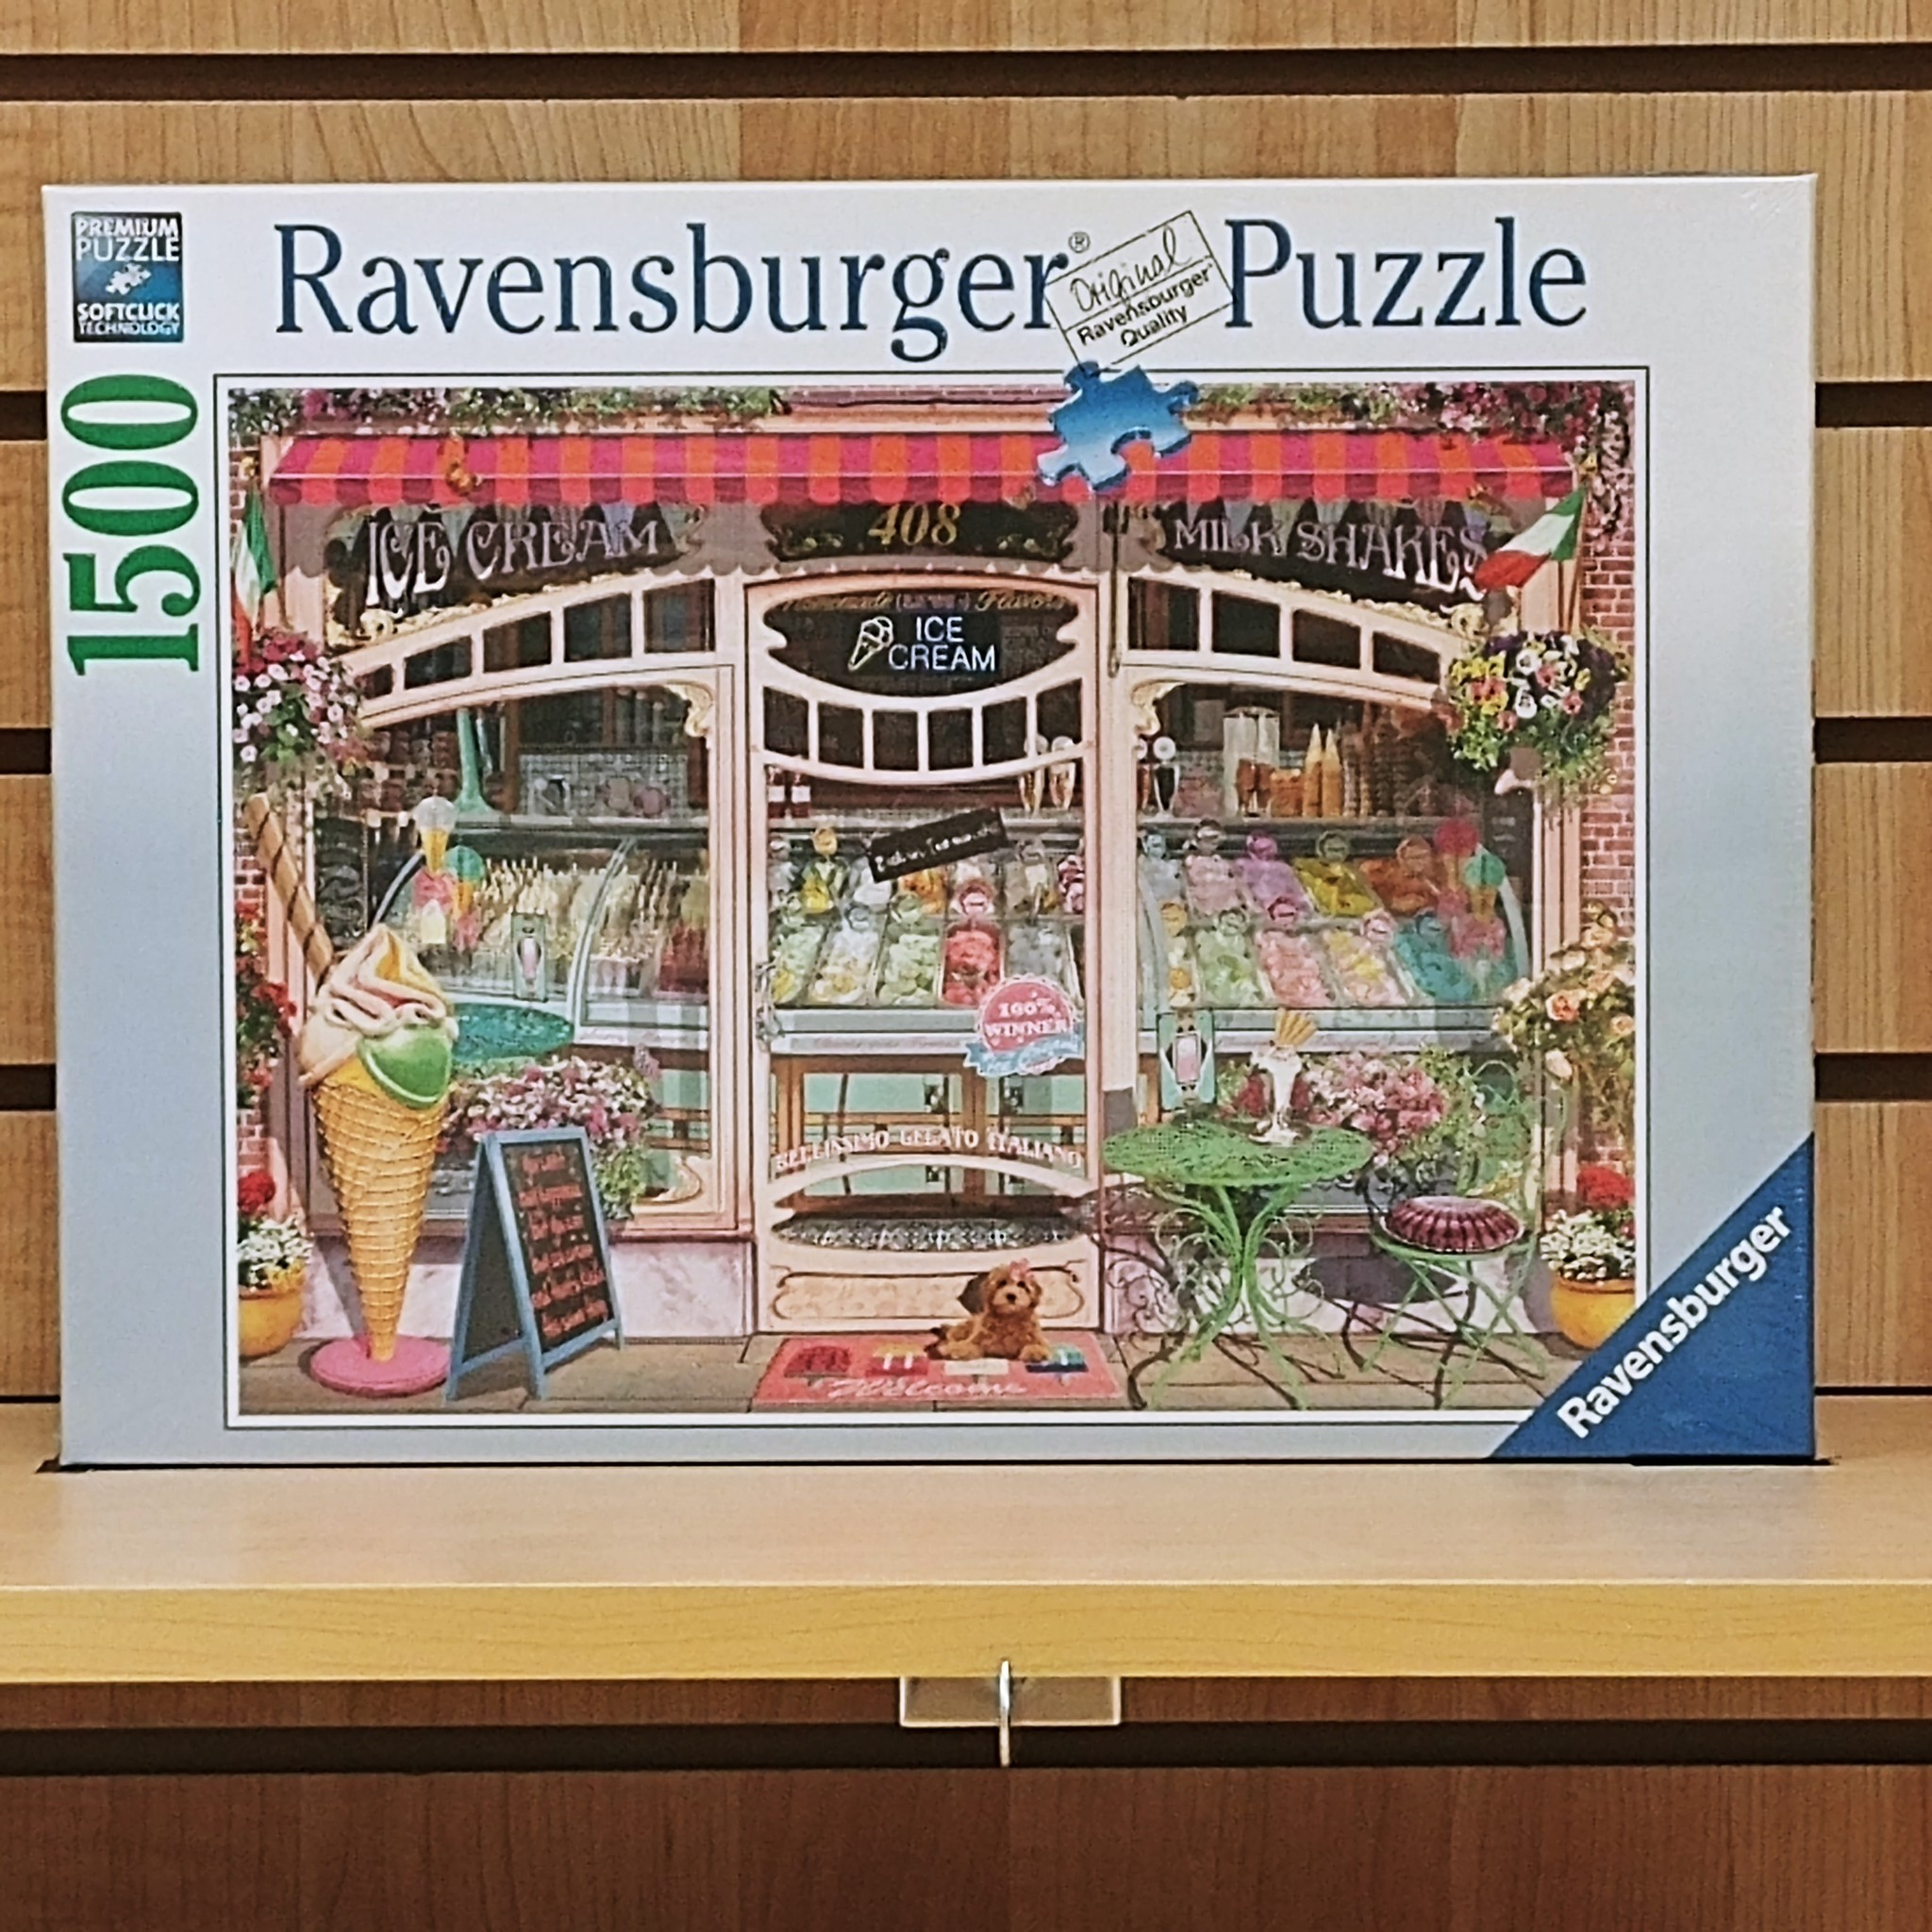 1500pc Jigsaw Puzzle Ravensburger Ice Cream Shop